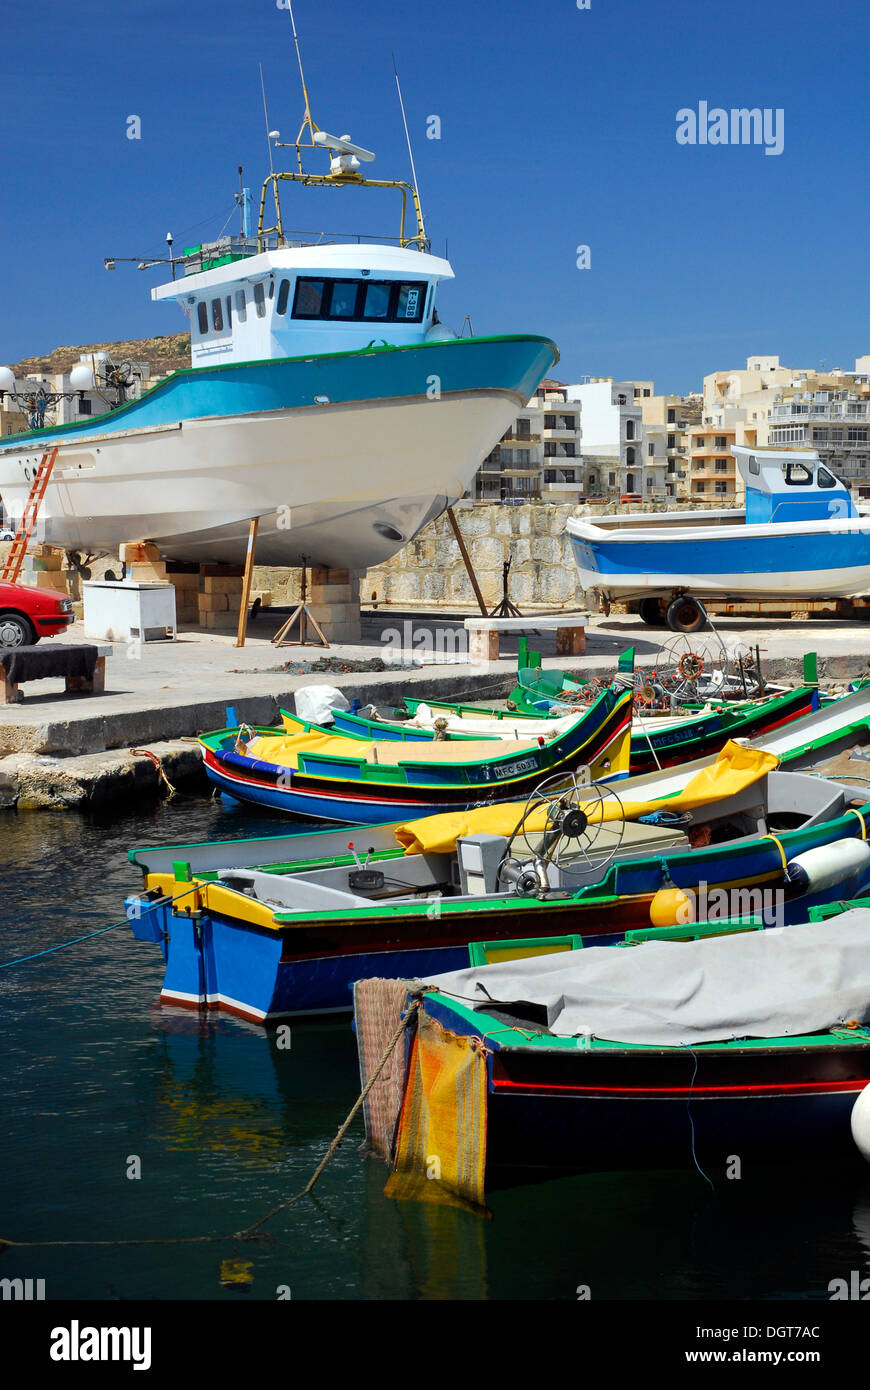 Fishing boats in the harbour, Marsalforn Bay, Marsalforn, Island of Gozo, Malta, Mediterranean, Europe Stock Photo